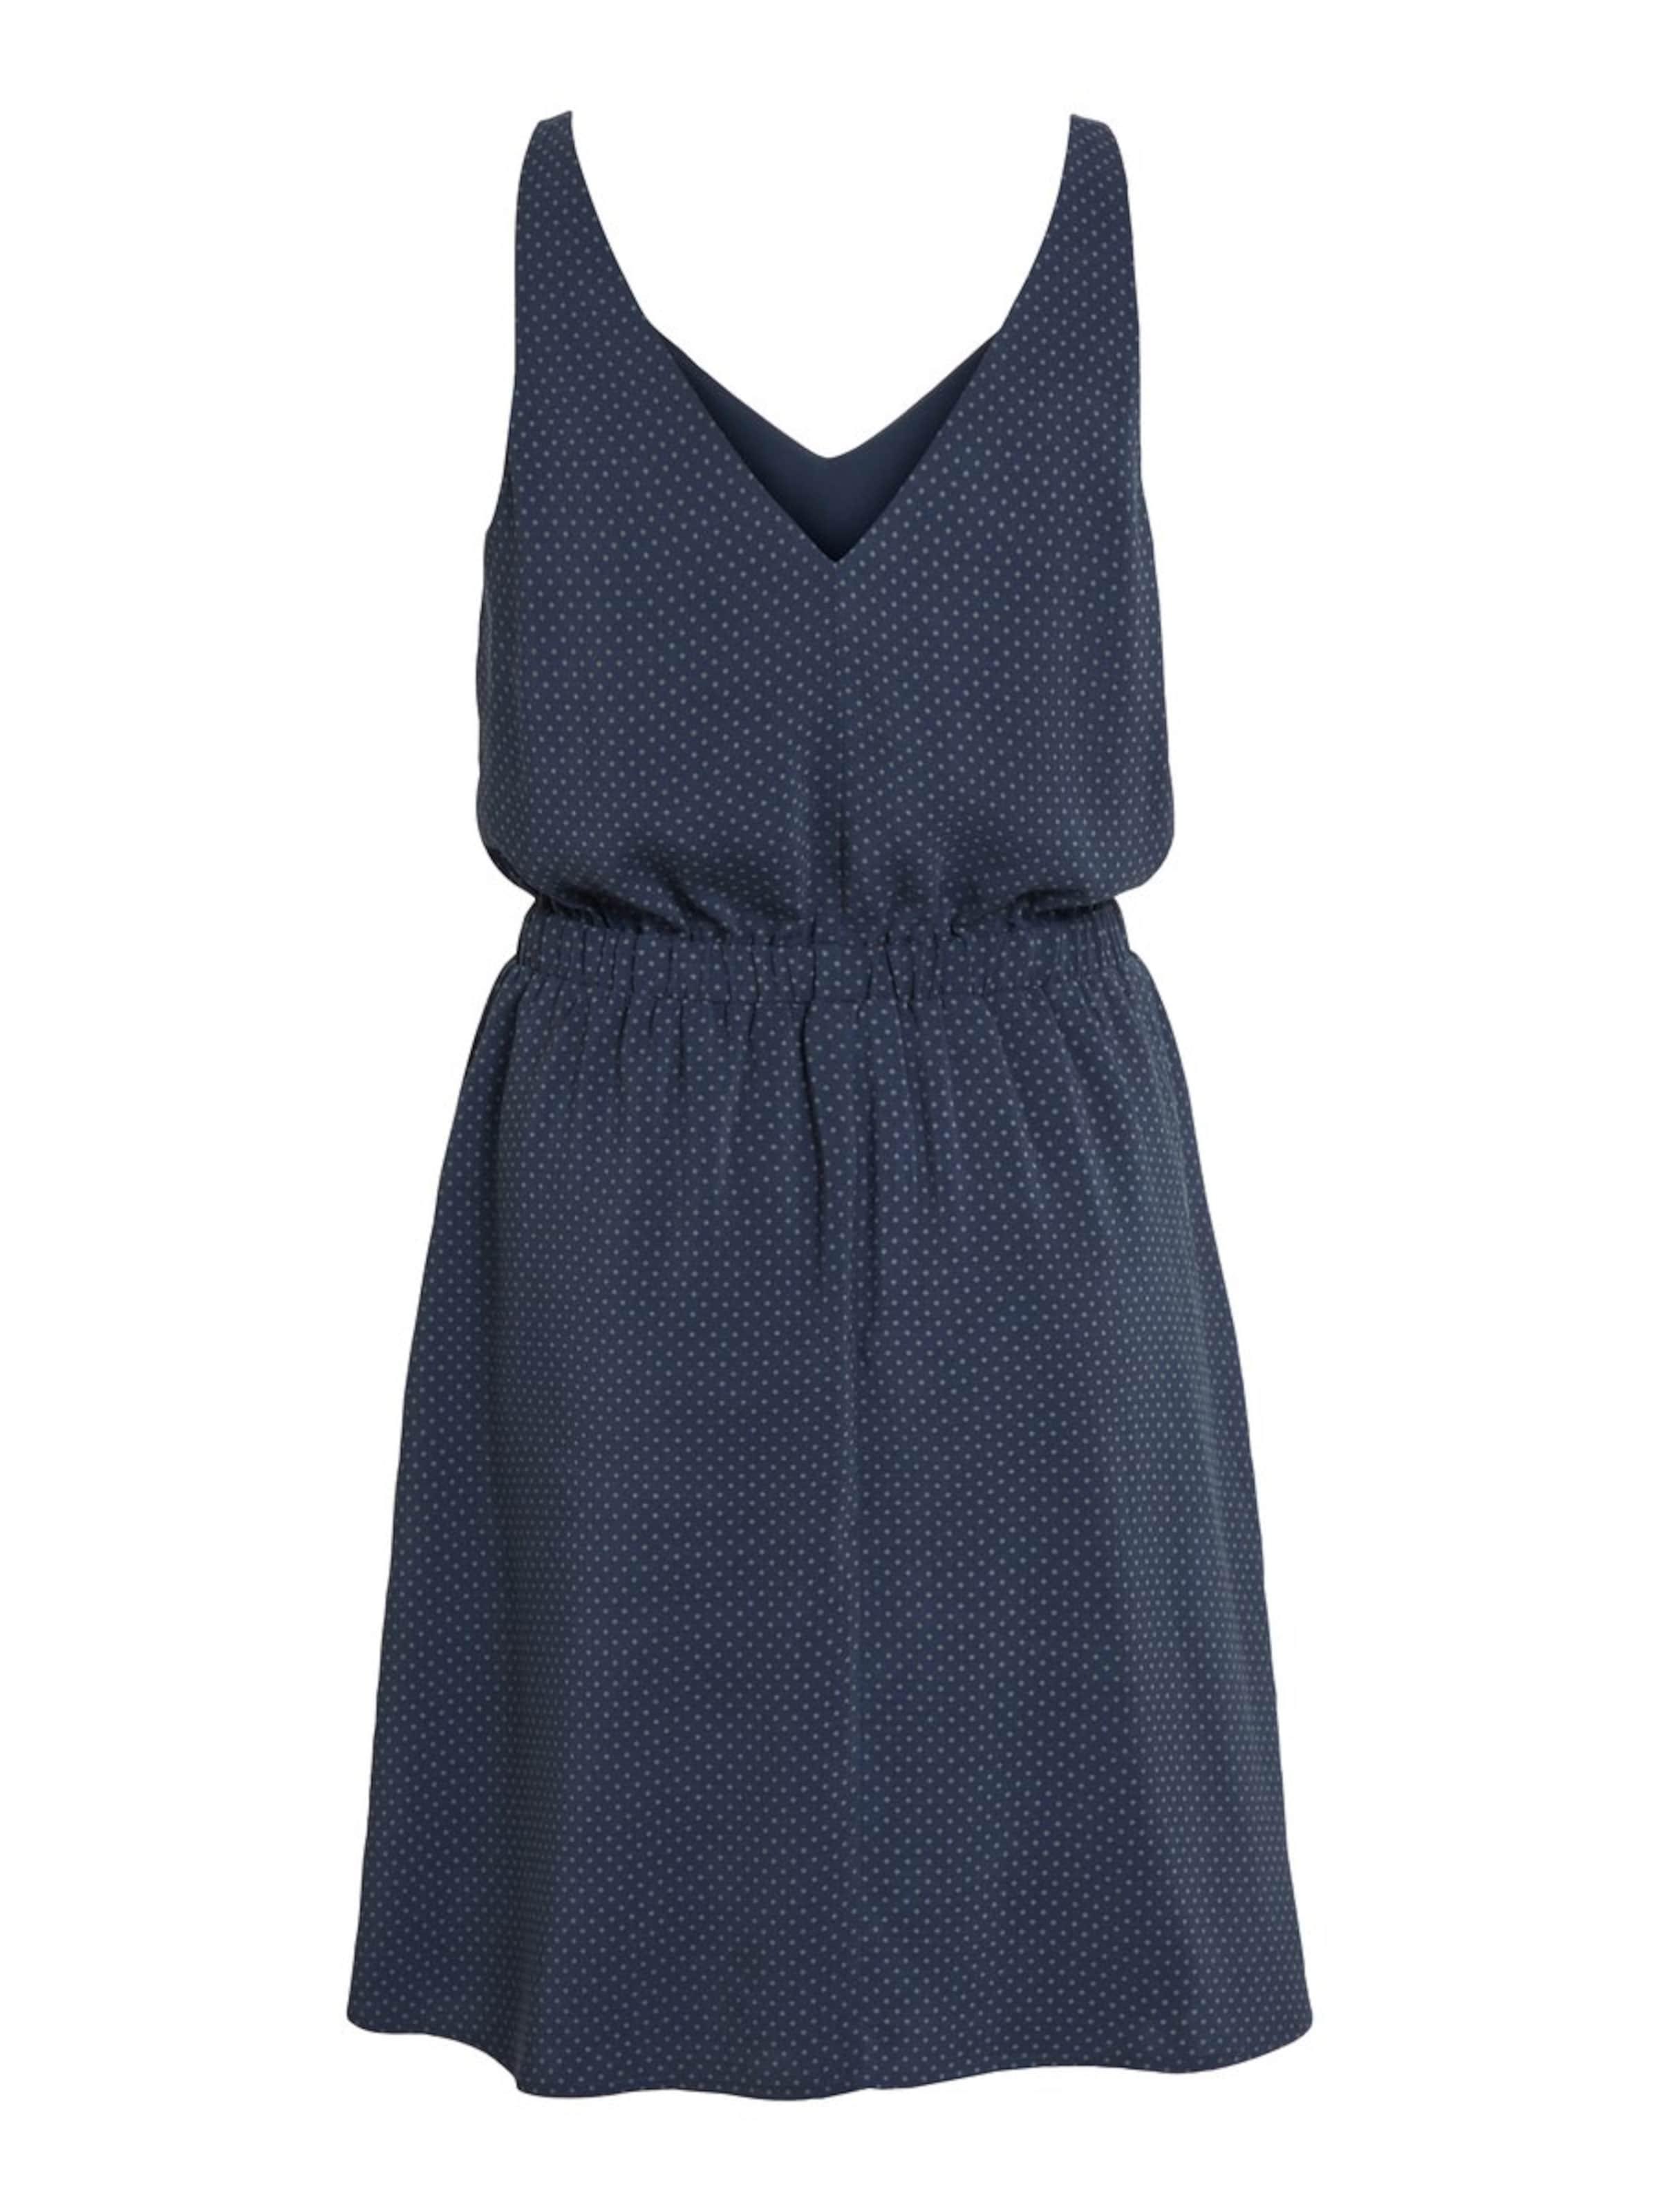 Nachtblau Kleid Vila Kleid In Vila VqpGLSUzM